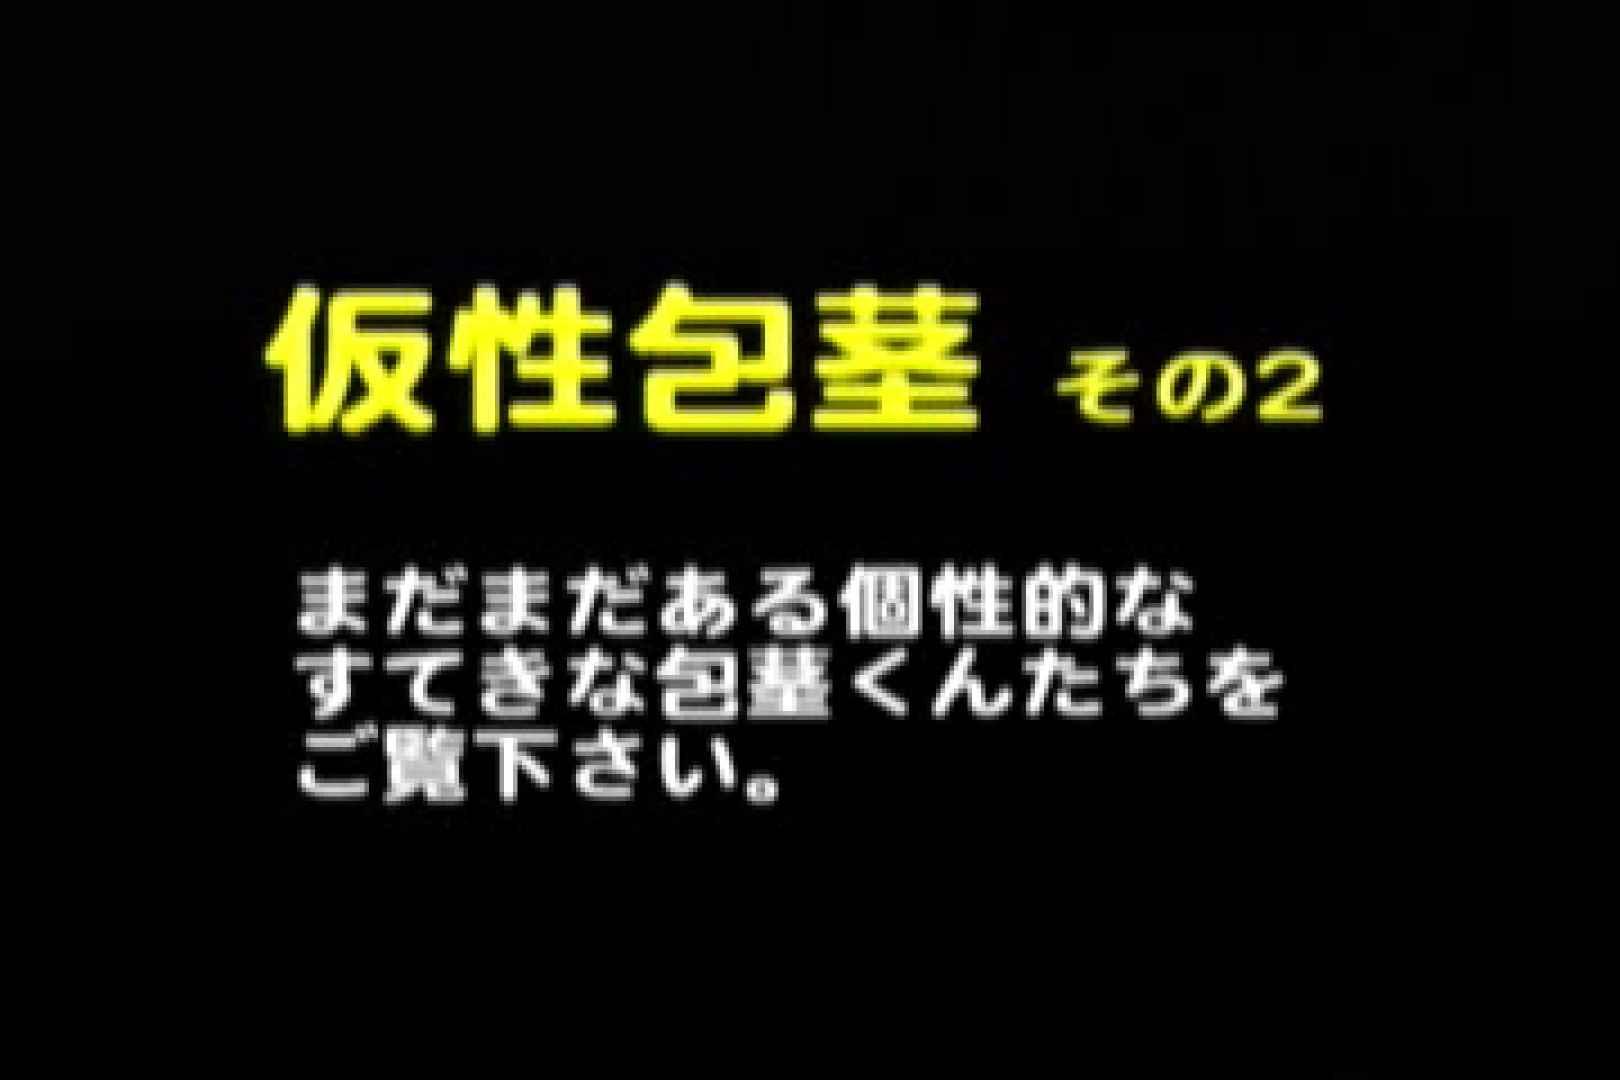 BABY FACEな包茎事情!!4FACEの快楽 フェラ ゲイ素人エロ画像 104枚 1